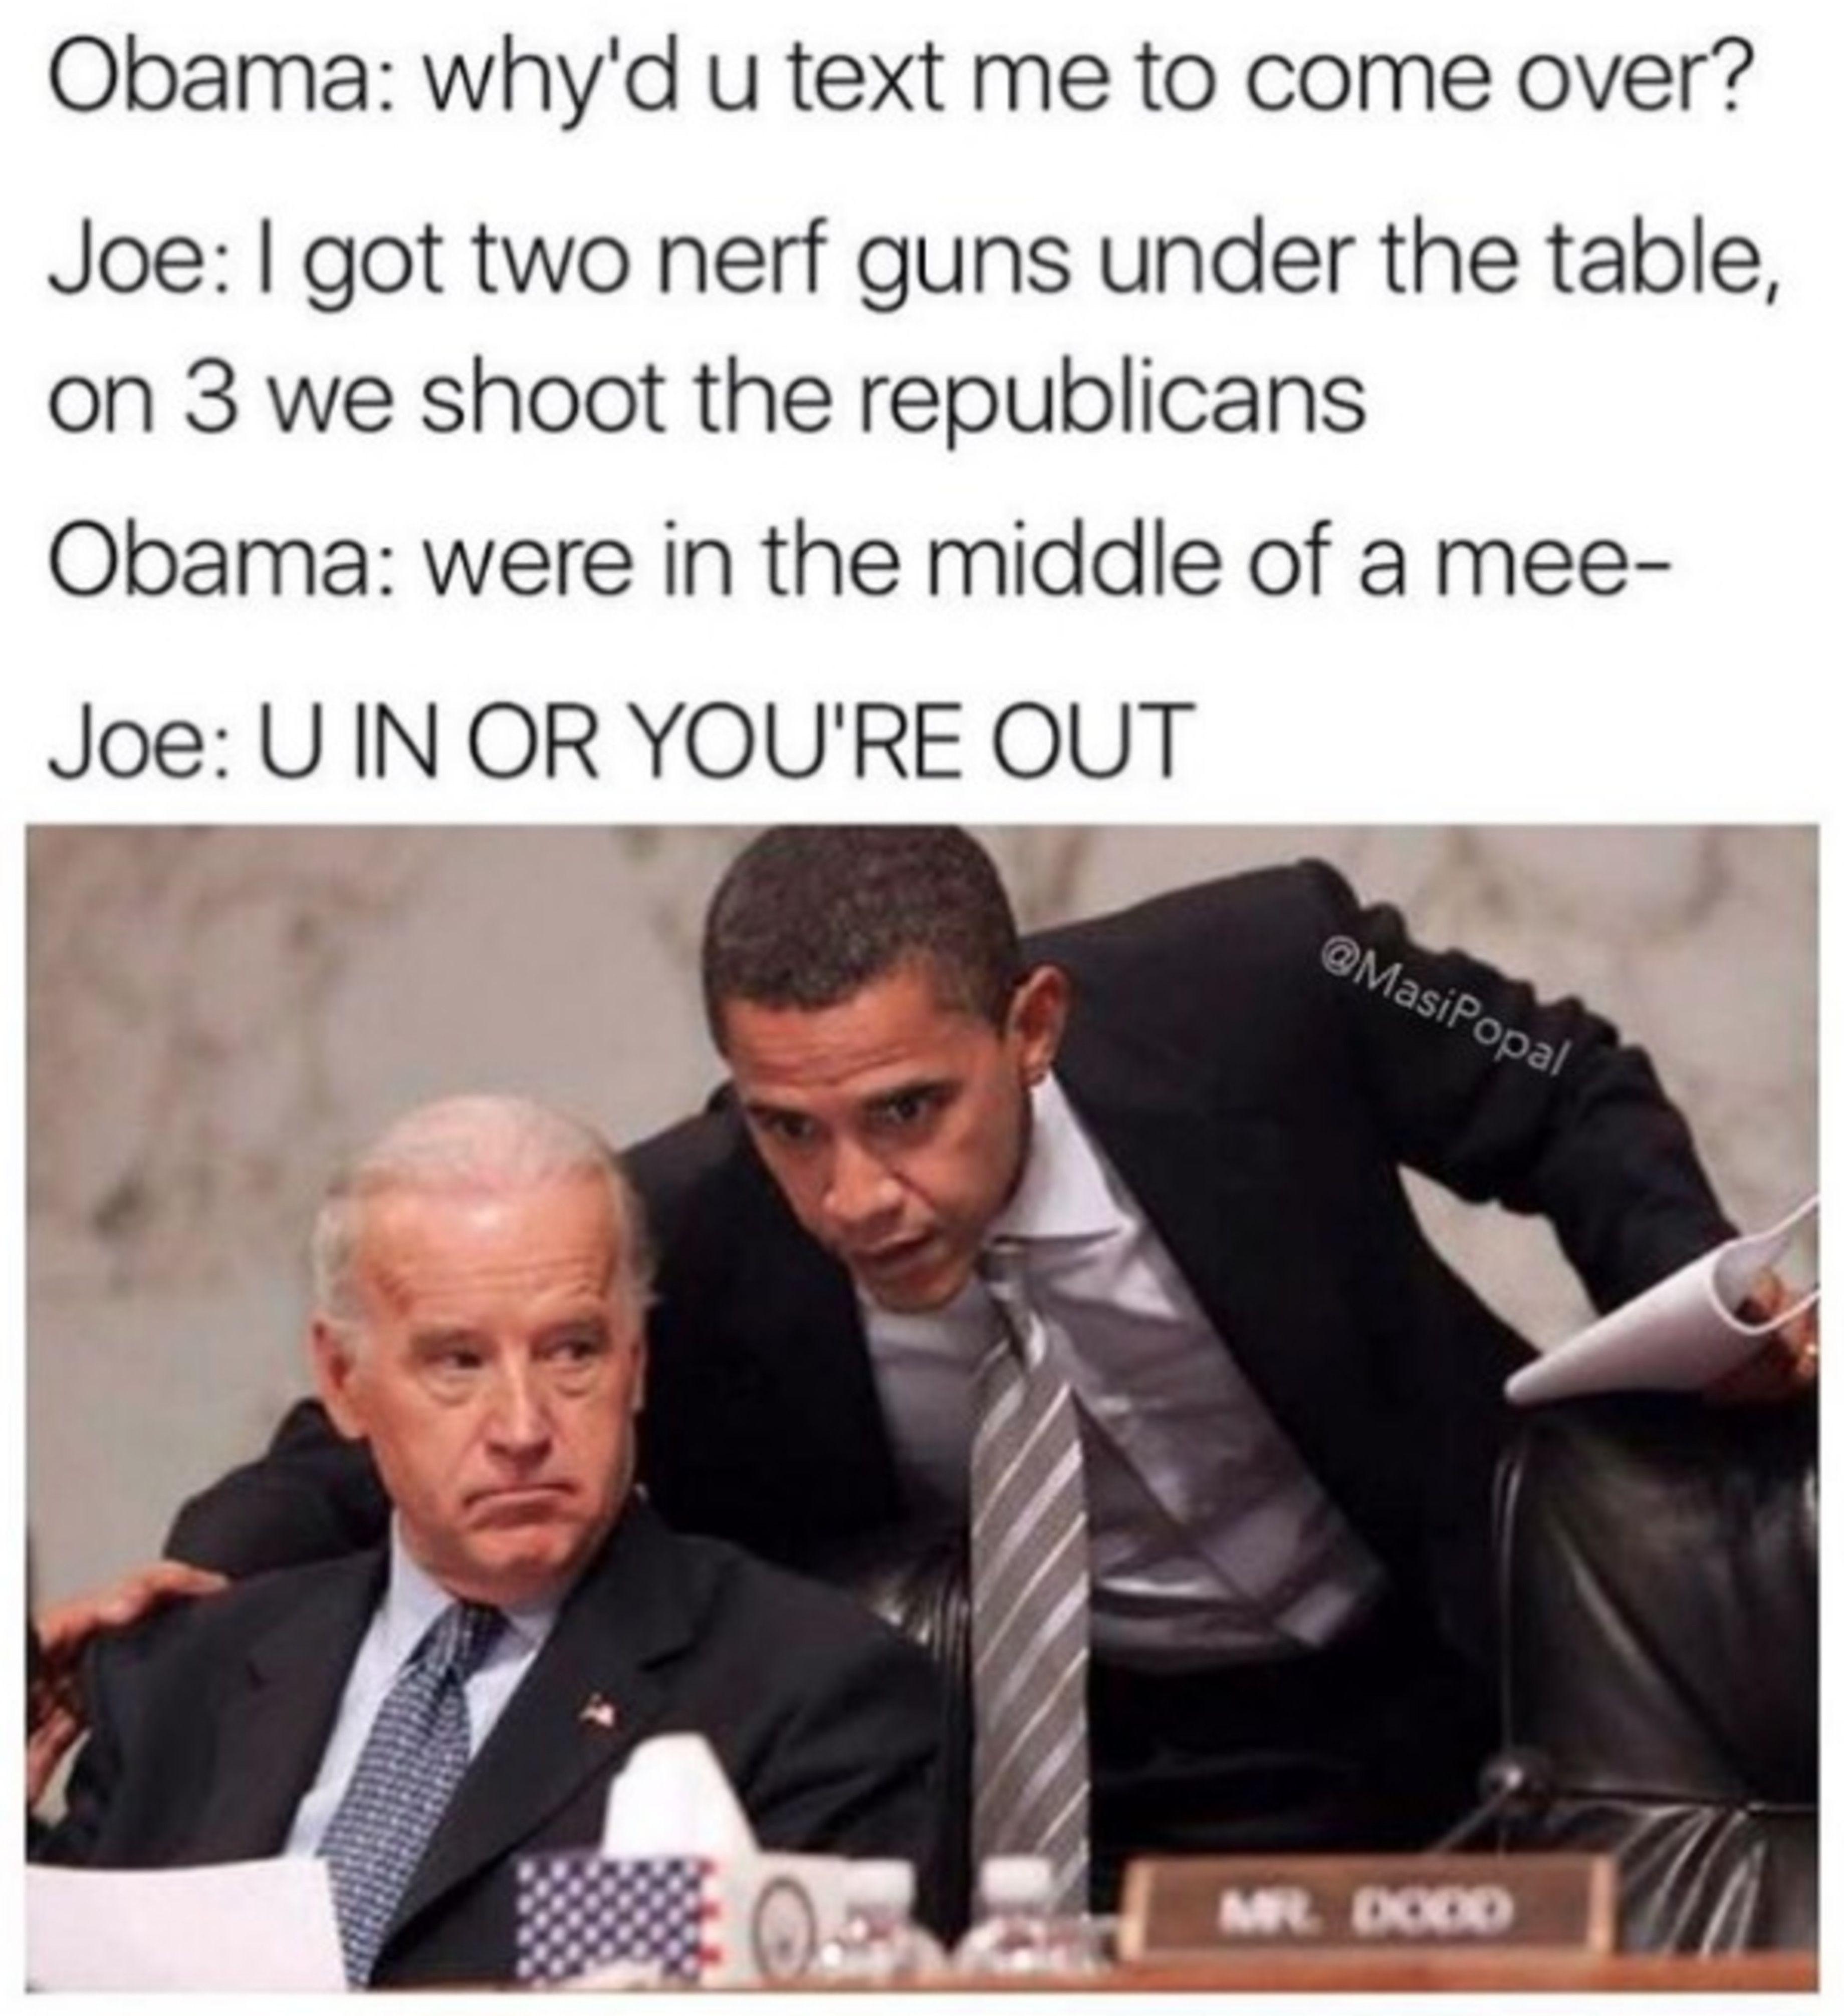 Funny Obama Quotes All The Best Presobama & Joe Biden Memes Floating Around The